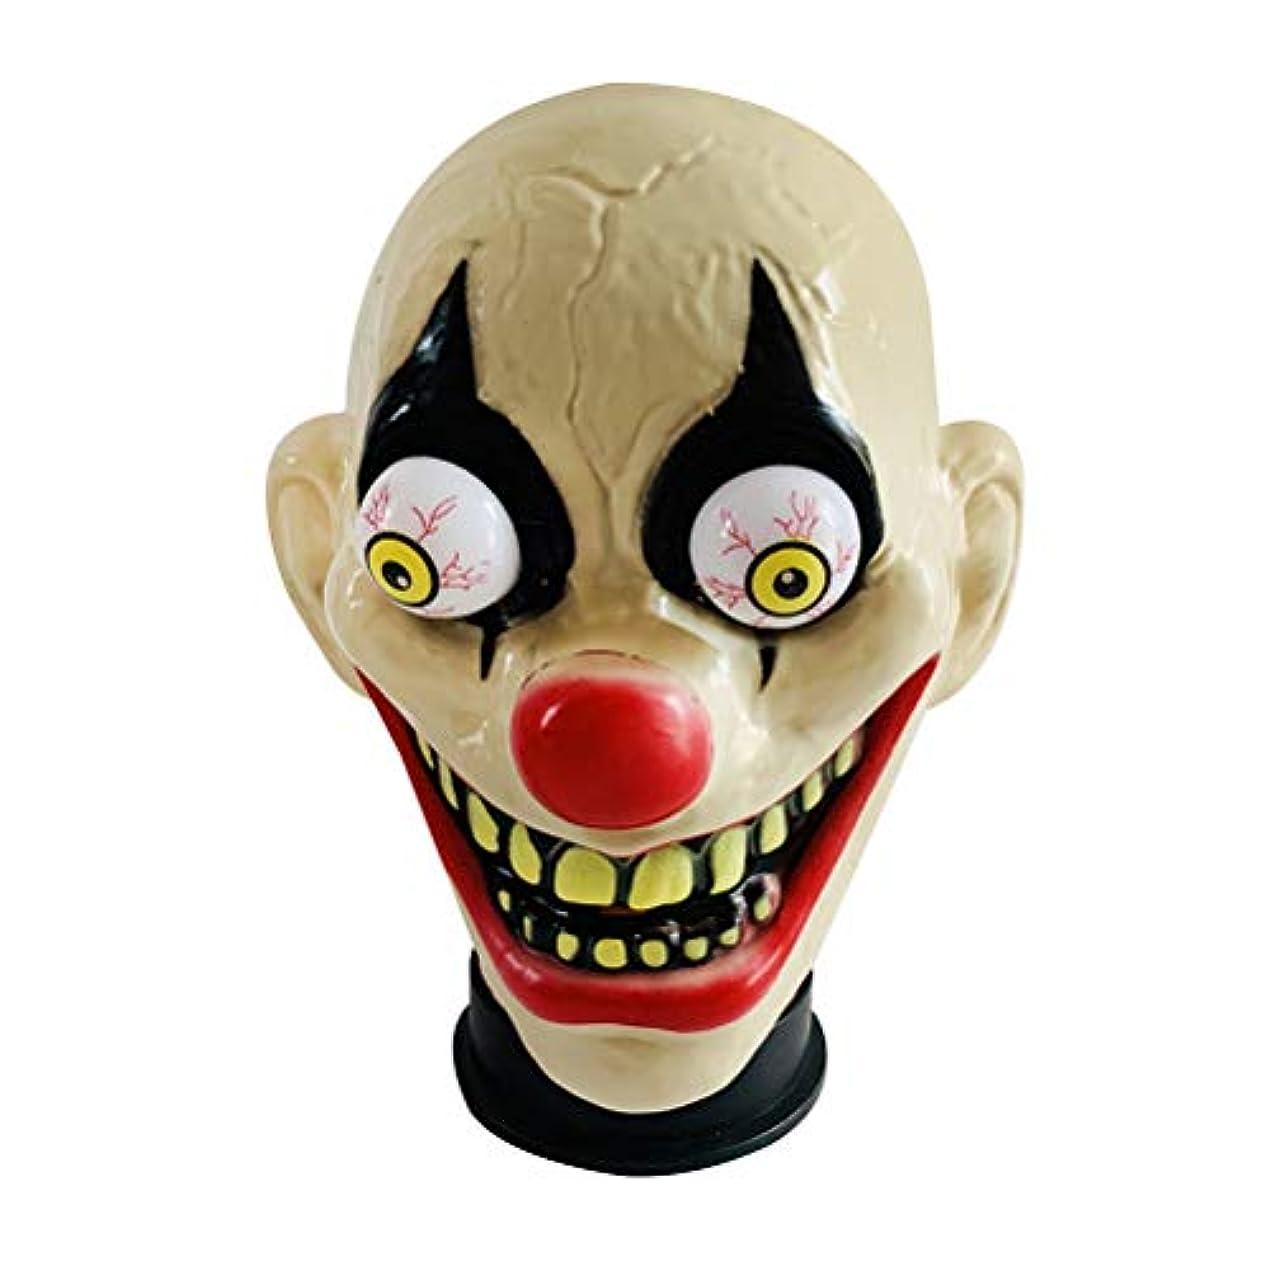 BESTOYARD ハロウィーン怖いピエロマスクテロホラーピエロヘッドカバーハロウィンコスプレパーティー用男性用マスク(ピエロタイプ)